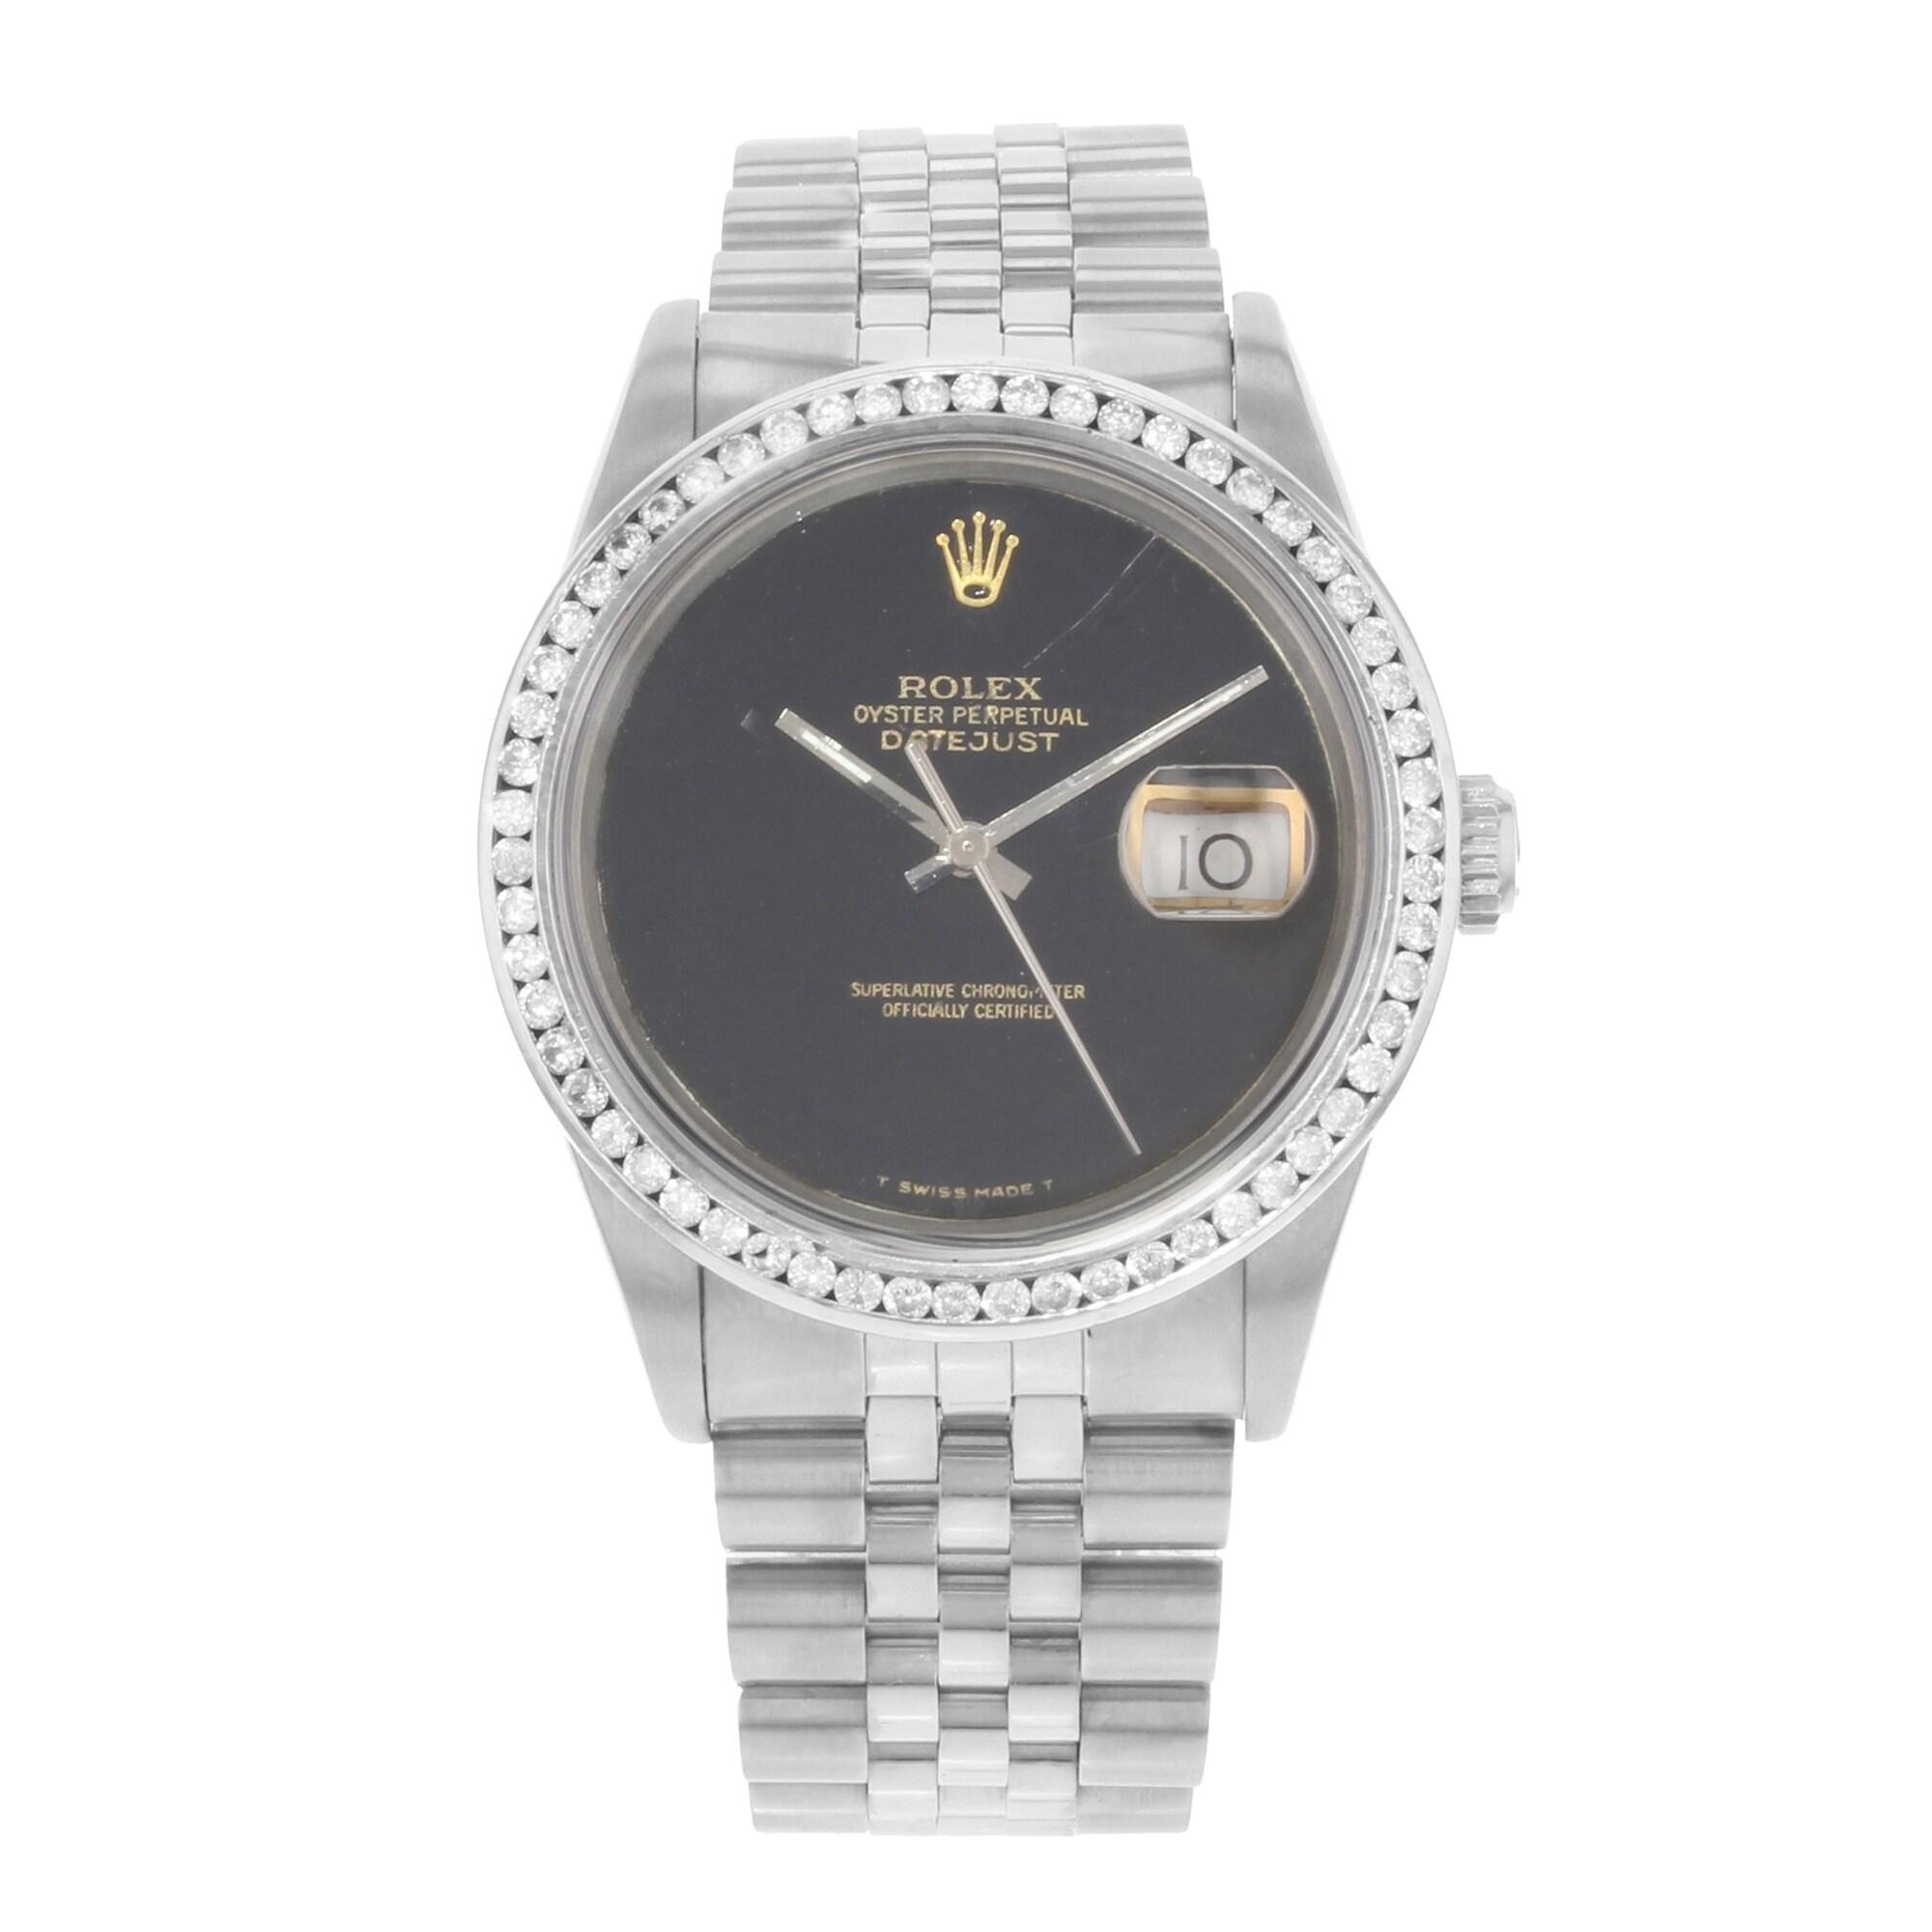 8b001969d7c45 Shop Rolex Datejust 16220 Custom Diamond Bezel Steel Automatic Men's ...